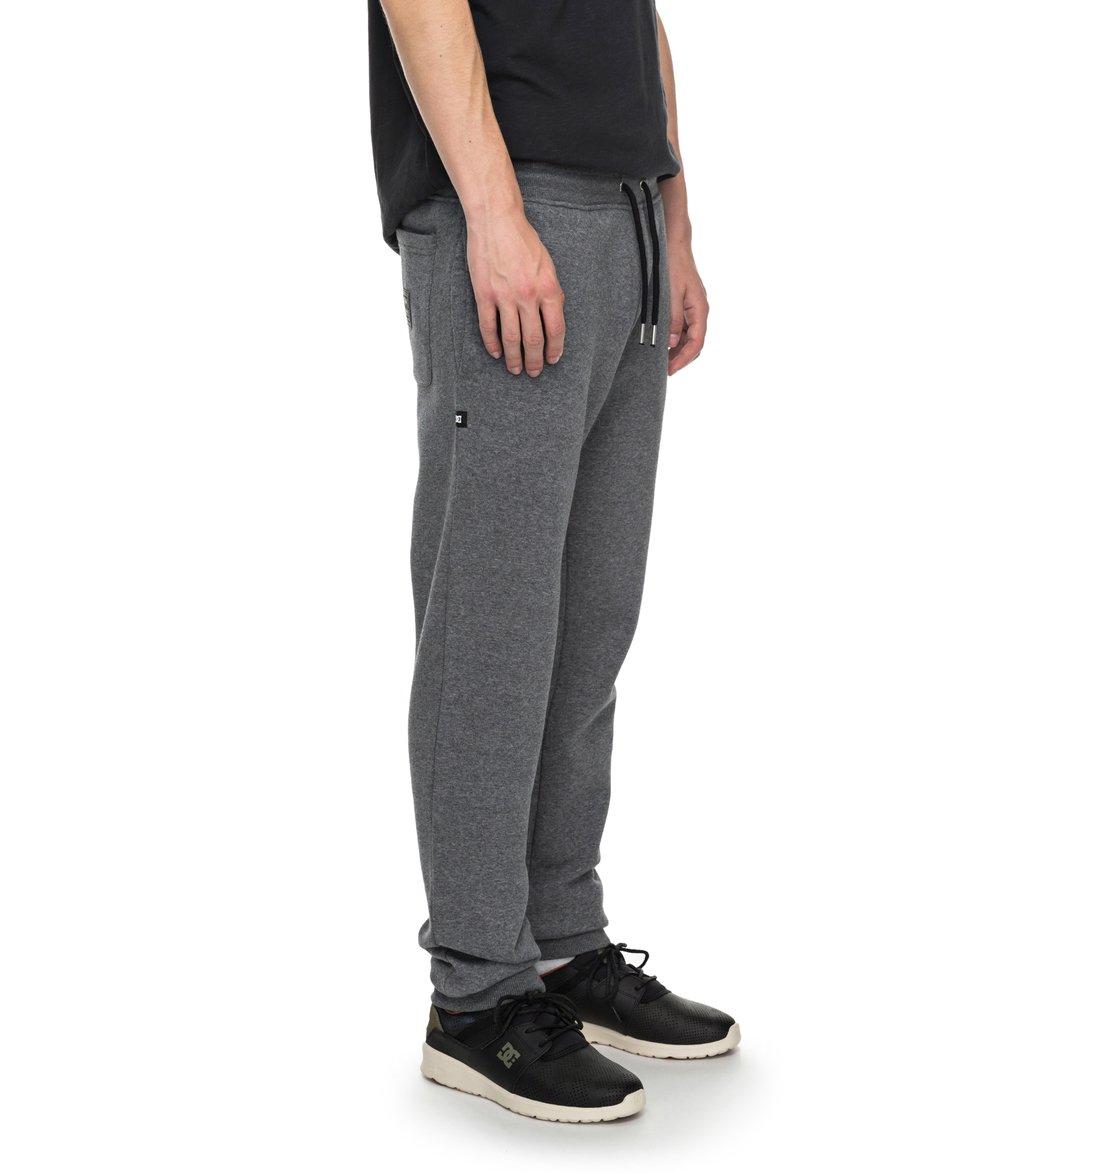 ellis pantalon de jogging edyfb03041 dc shoes. Black Bedroom Furniture Sets. Home Design Ideas